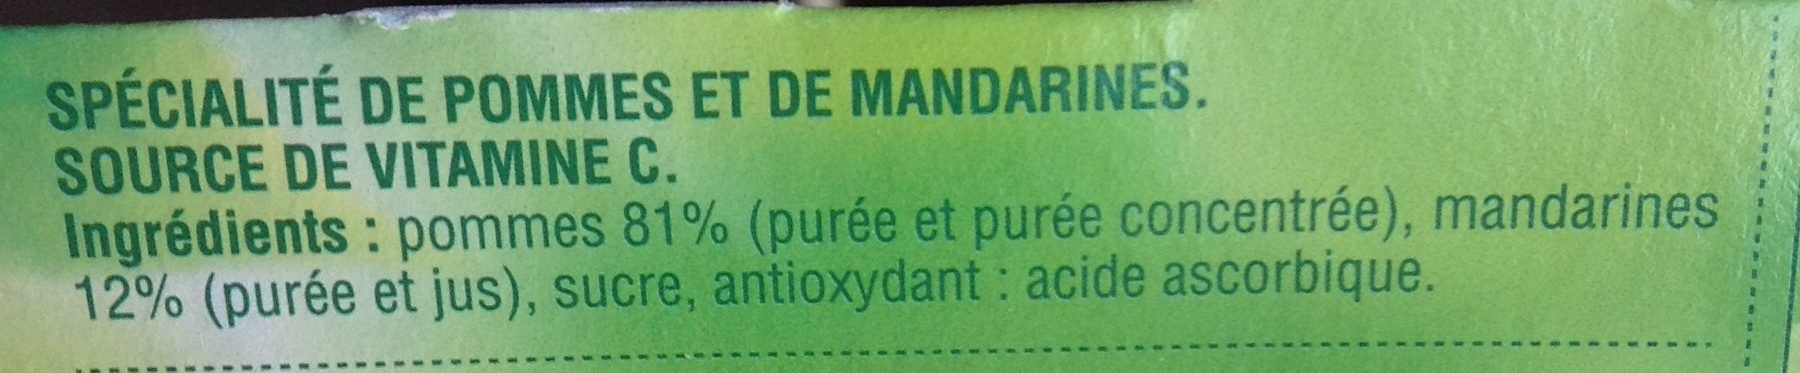 Compote pomme mandarine - Ingredients